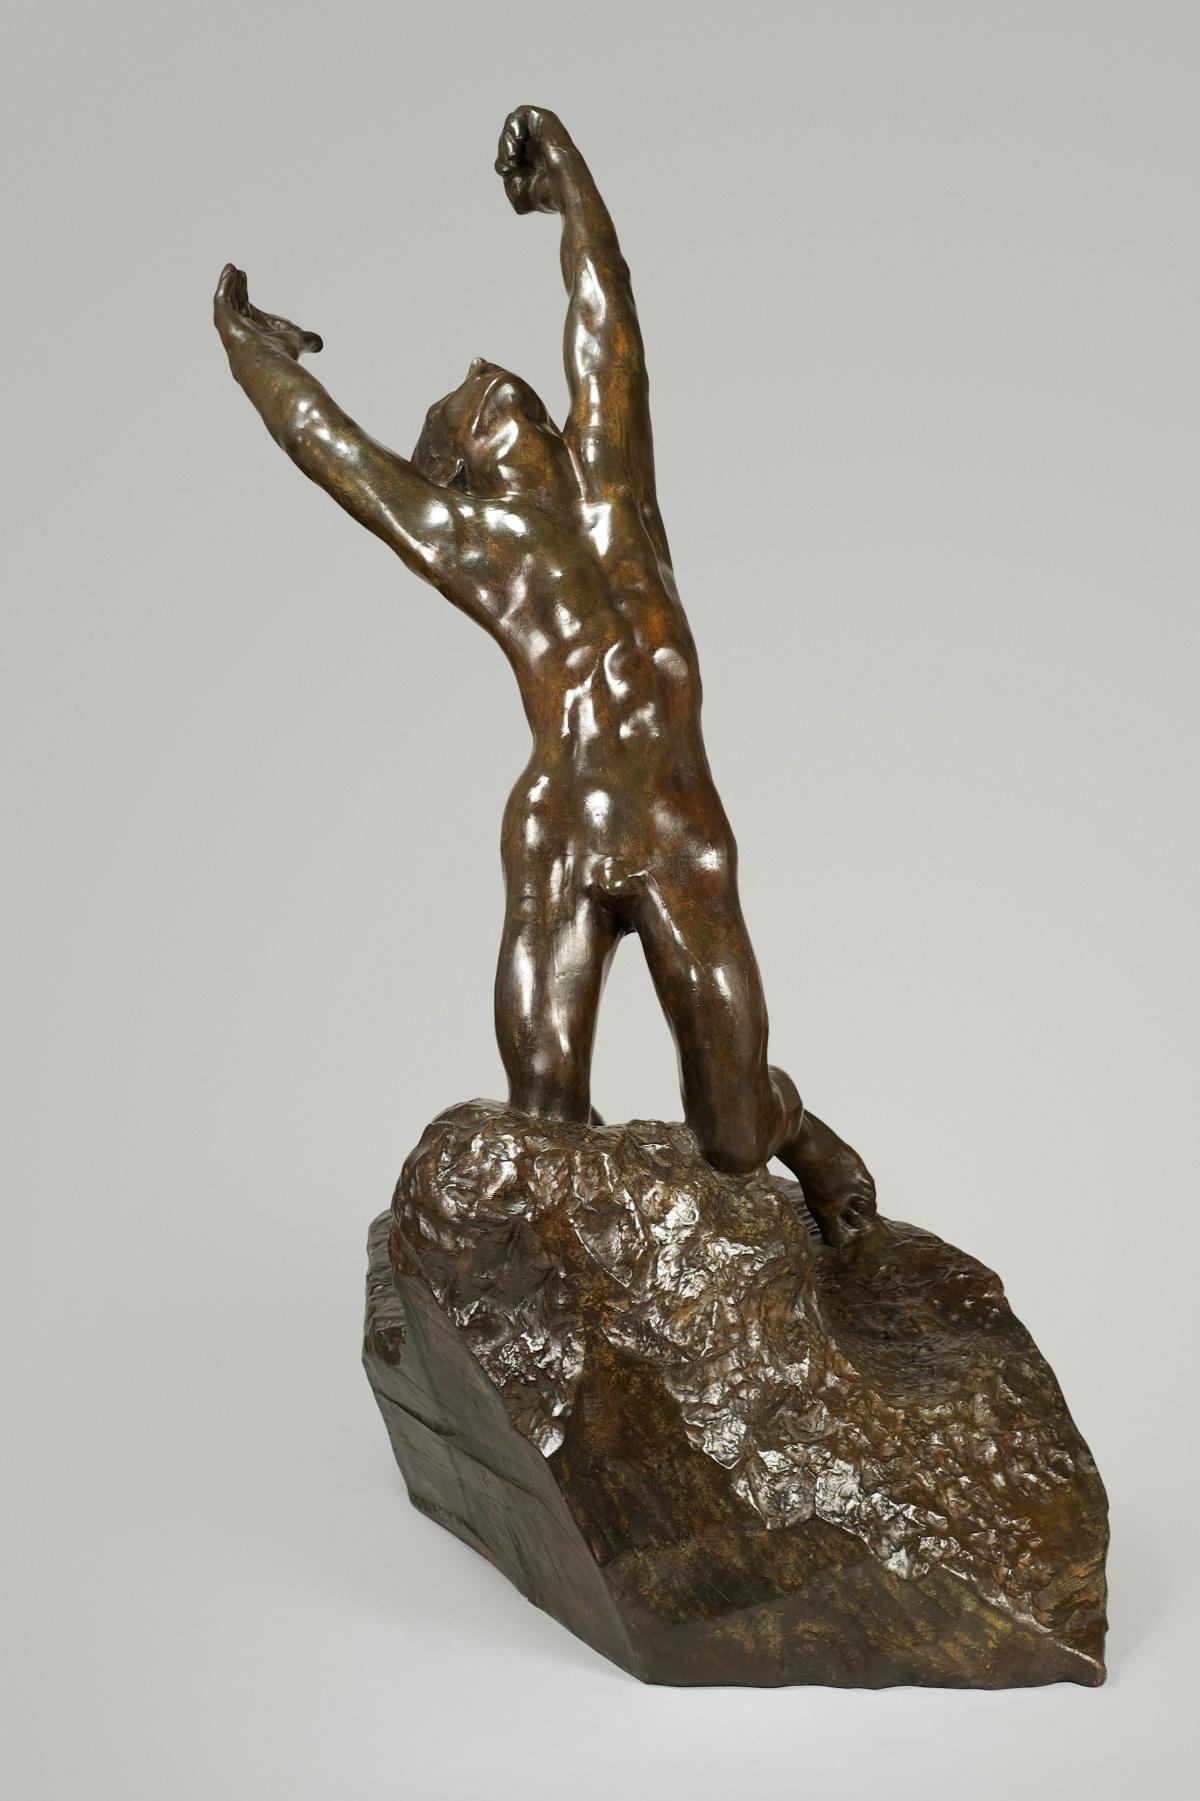 Rodin: In PrivateHands